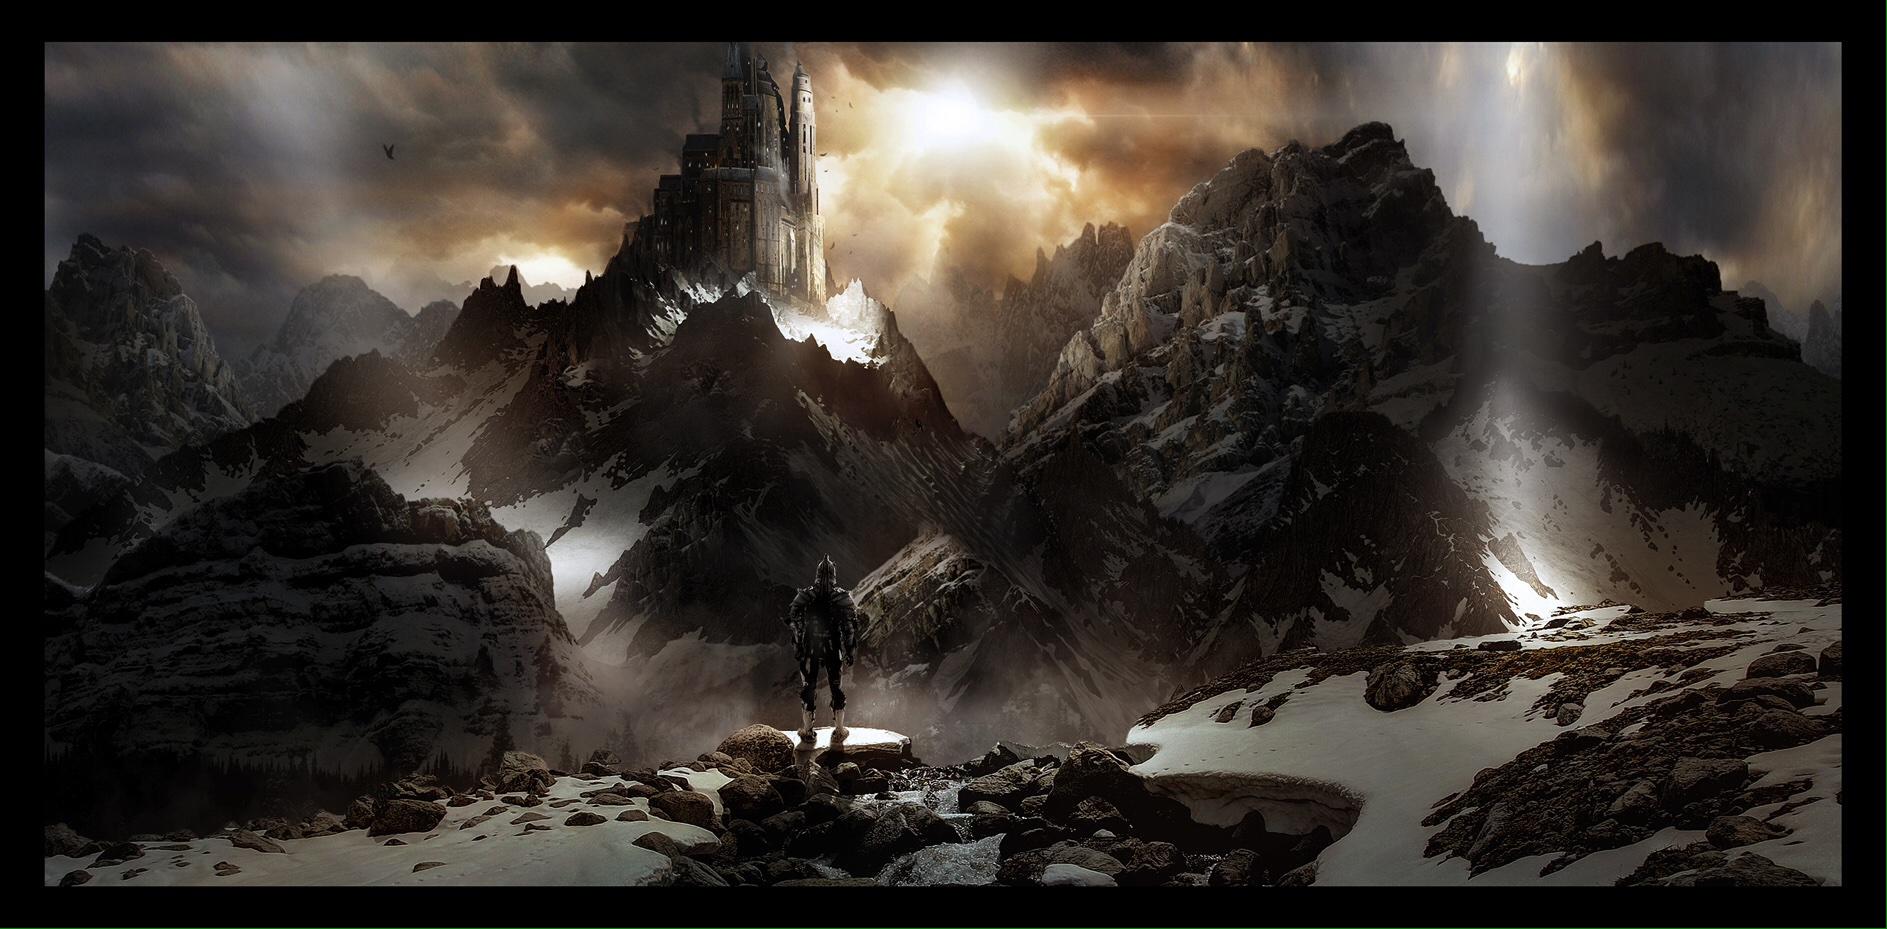 Epic New Sci Fi Works By Scott Richard Concept Artist